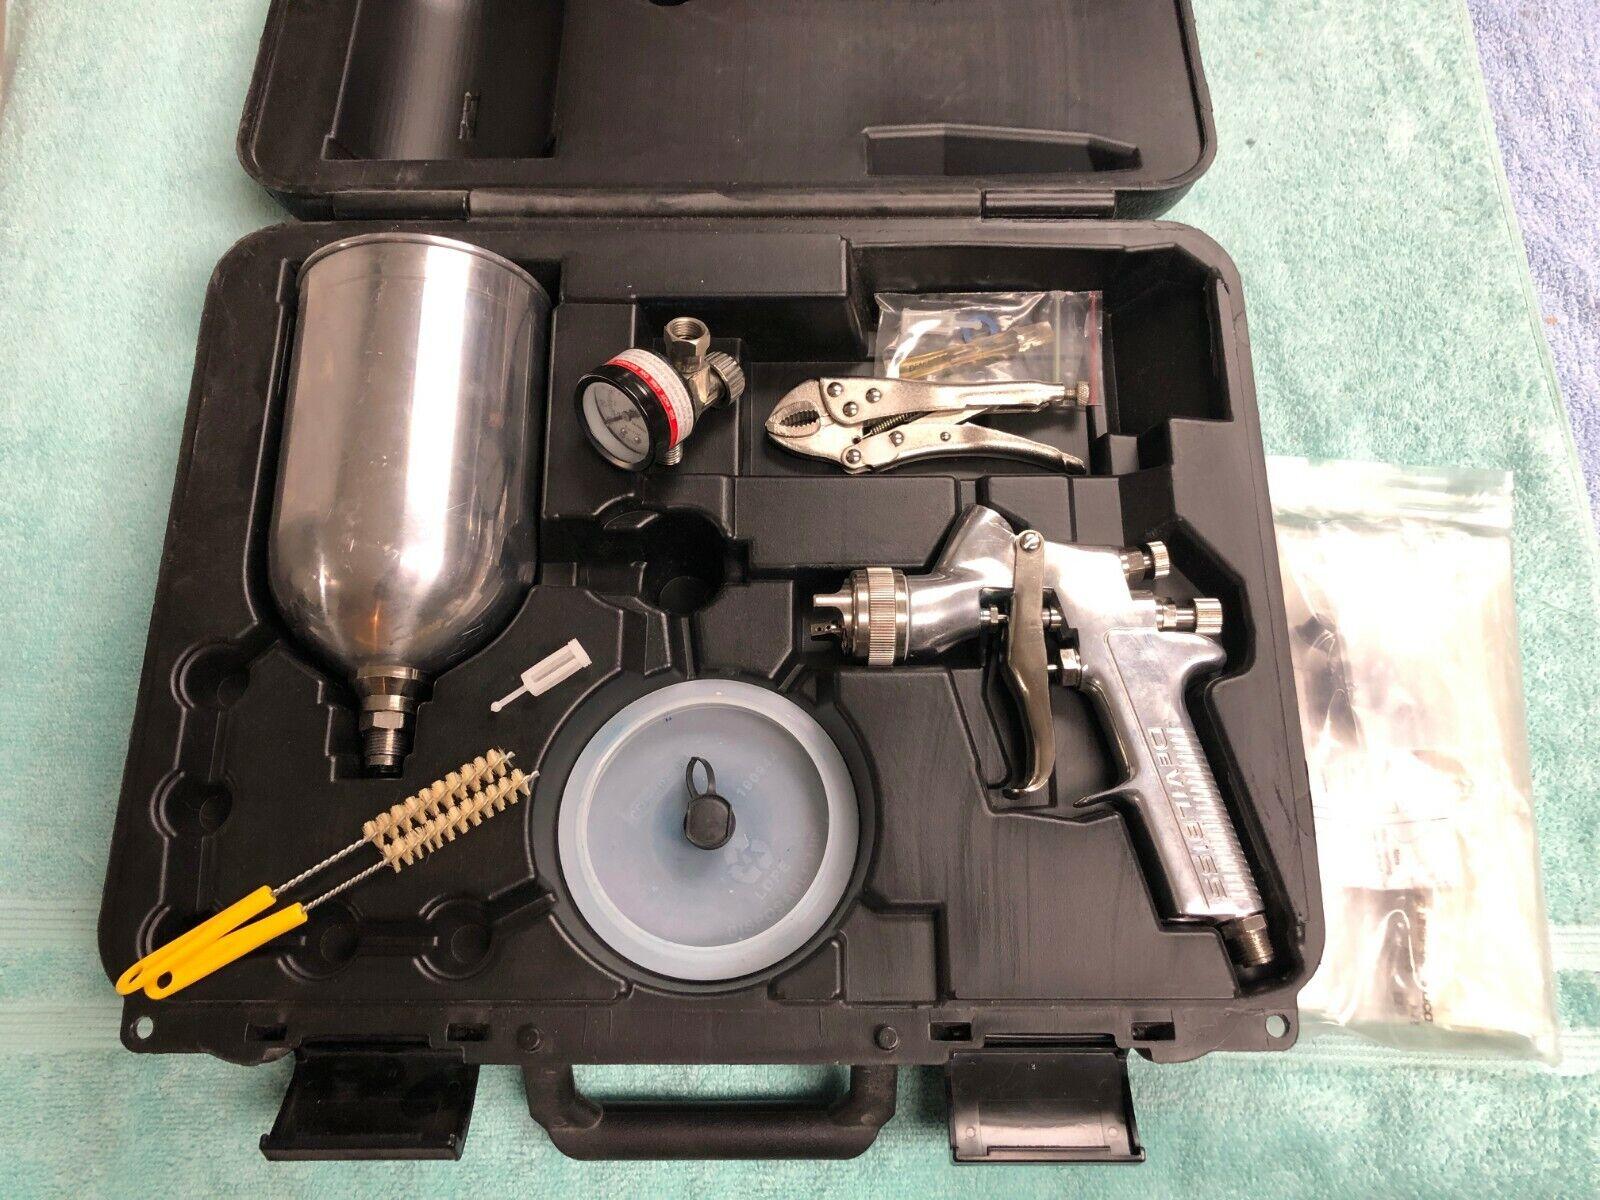 Devilbiss JGA-535G 1.4 Tip Gravity Feed Spray Gun w/ Cup, GTI-213-14 Tip